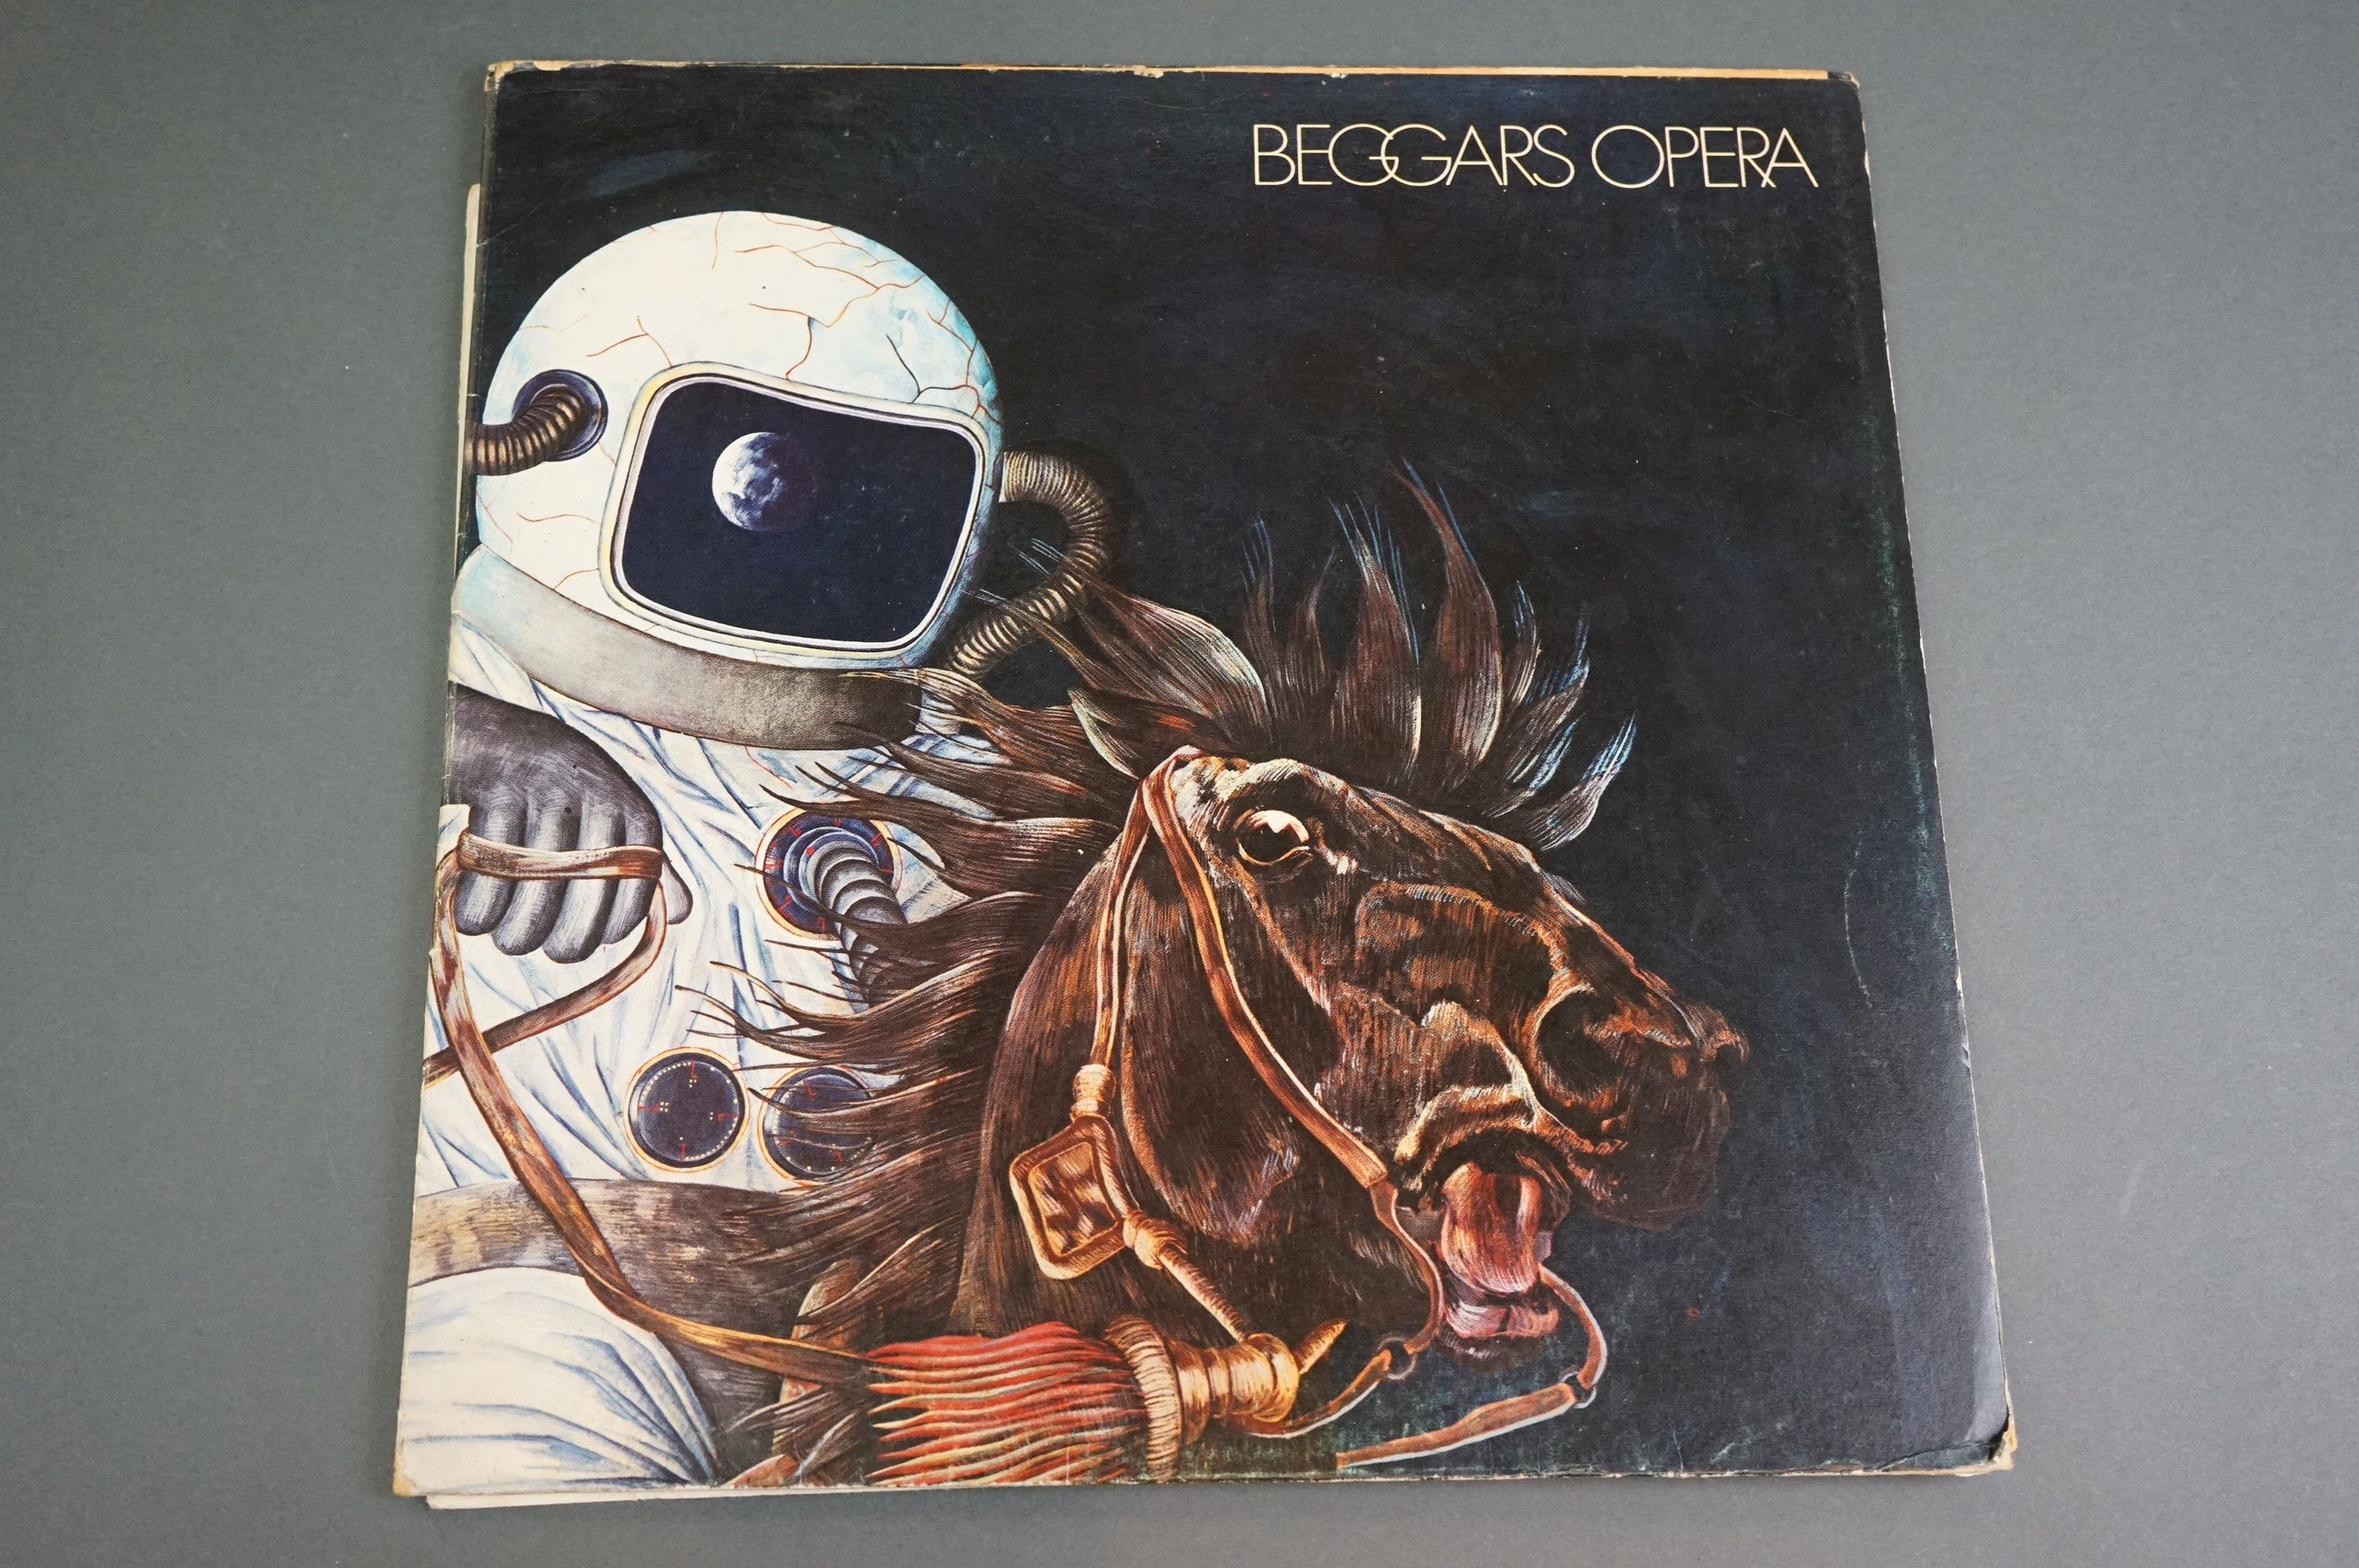 Vinyl - Two Beggars Opera LPs to include Pathfinder on Vertigo 6360073 small swirl label, foldout